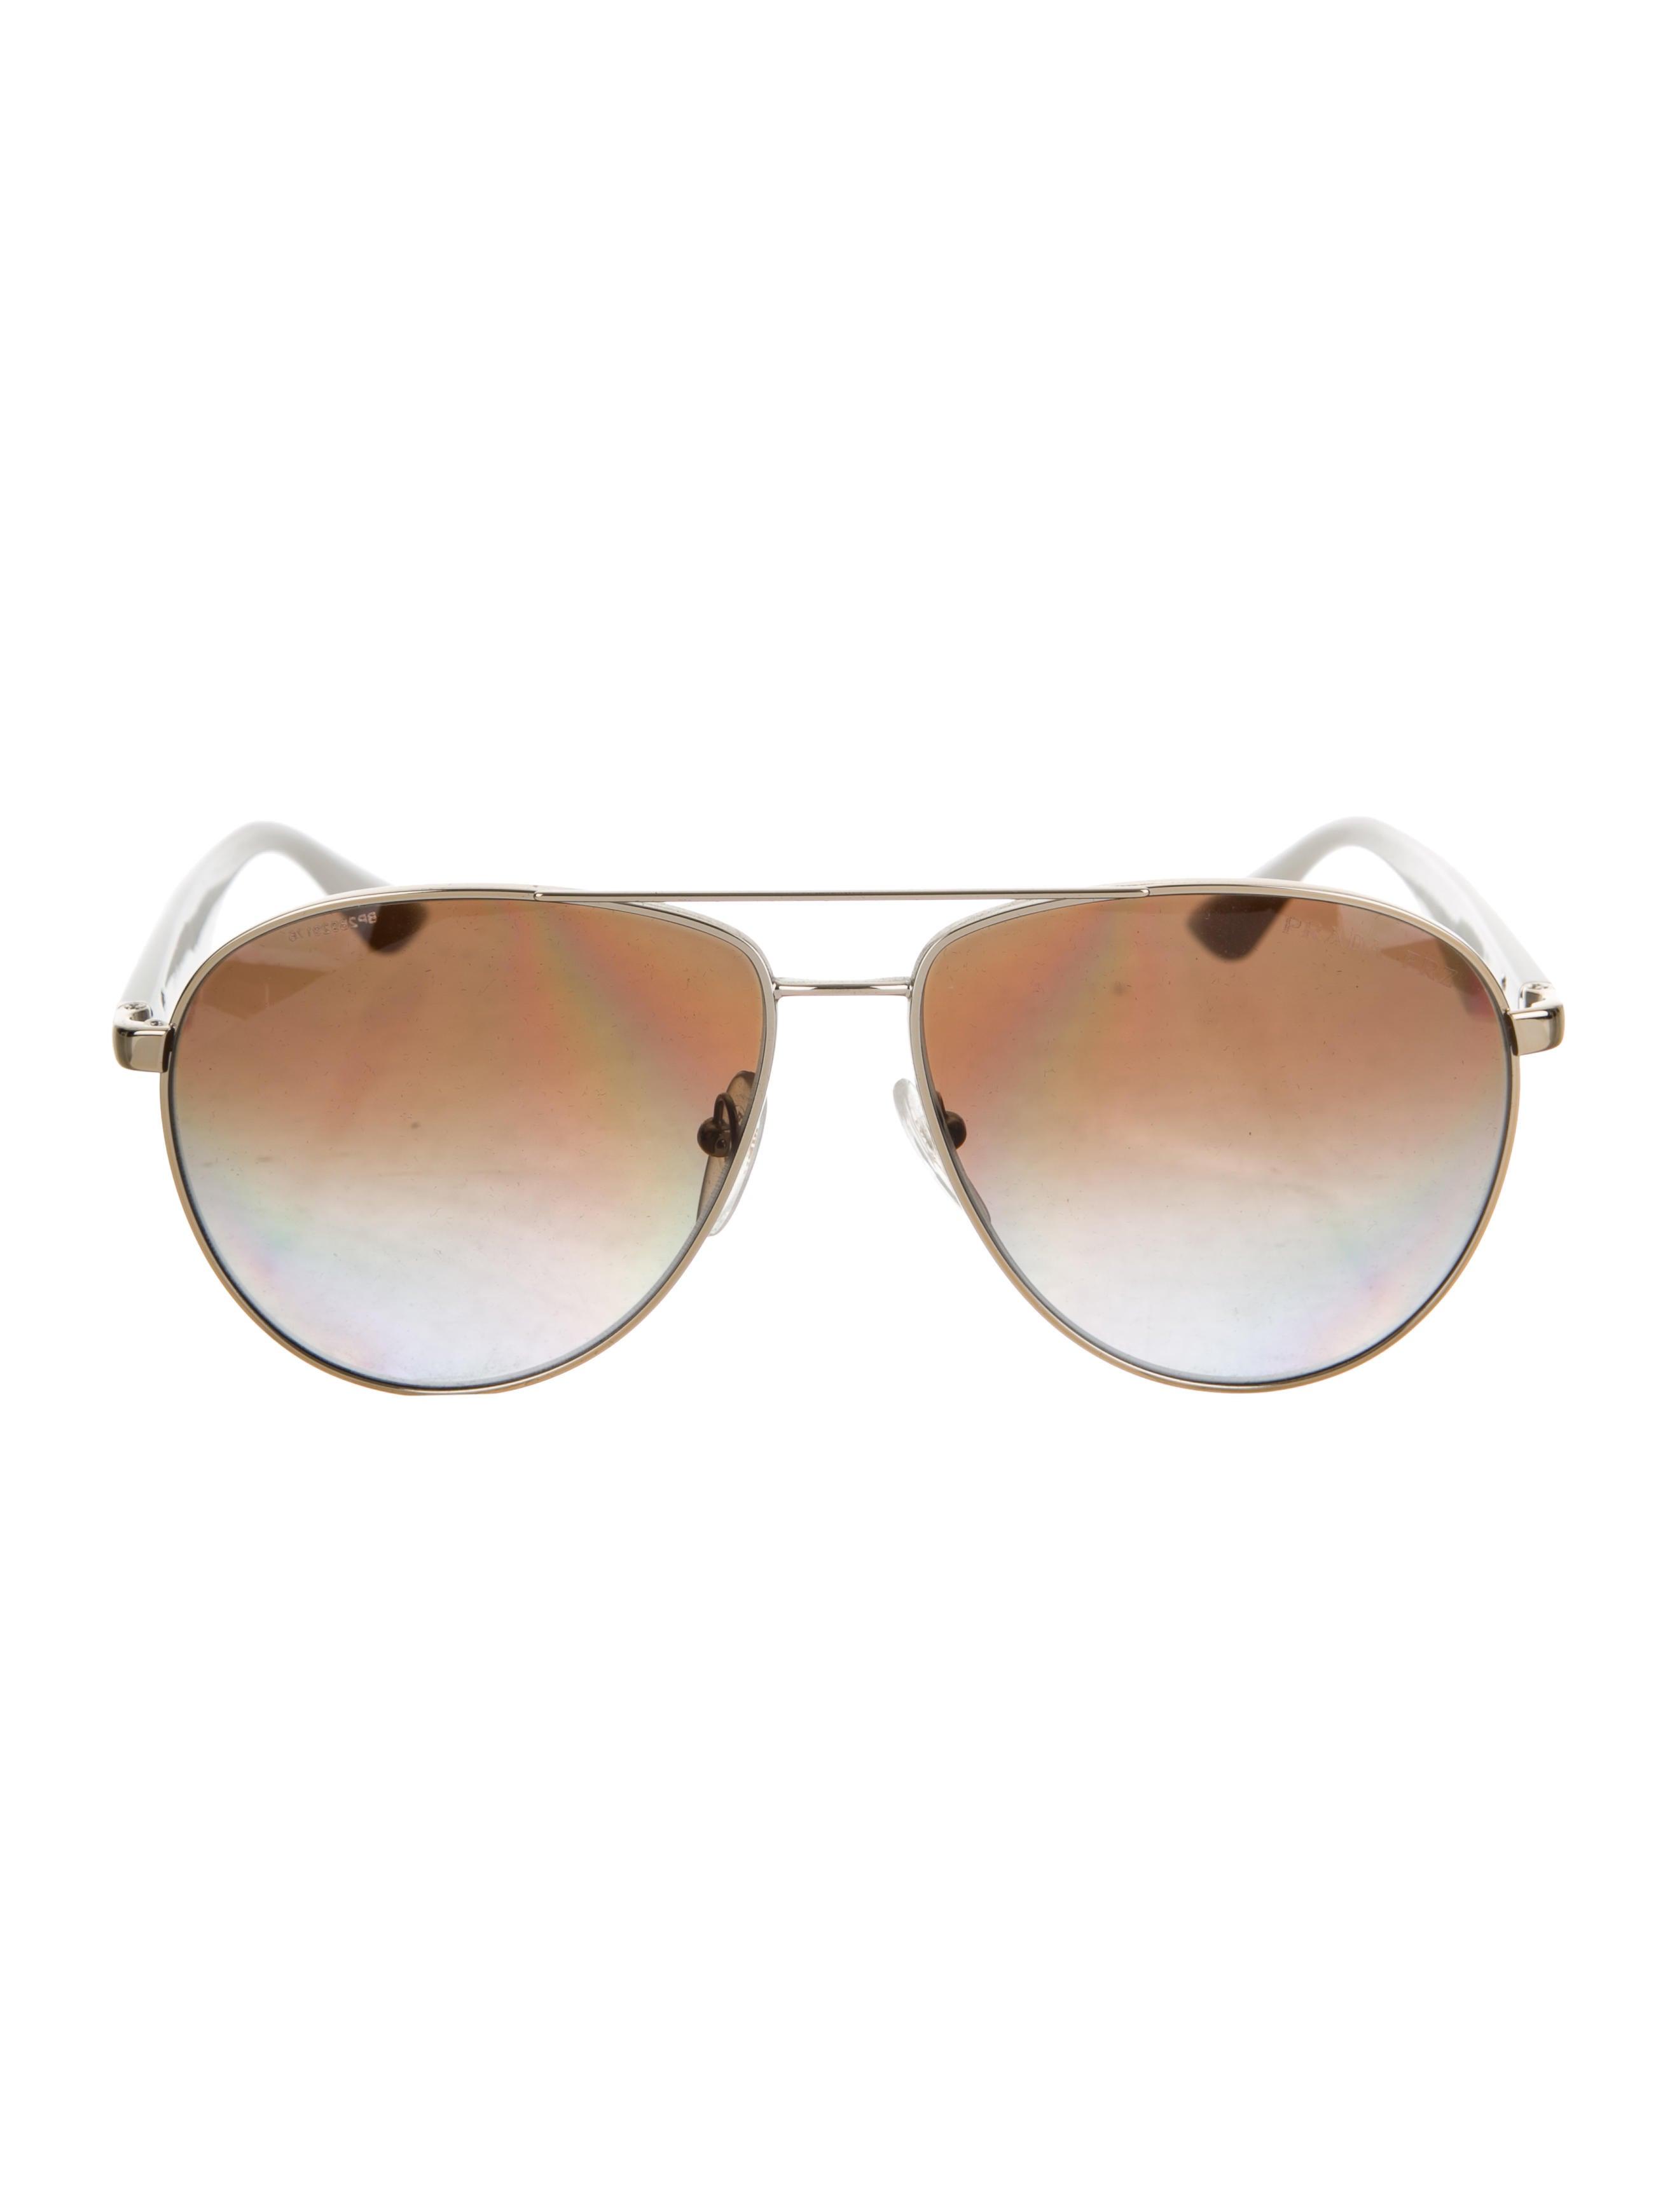 3a2f6896243 Prada Aviator Gradient Sunglasses - Accessories - PRA234638